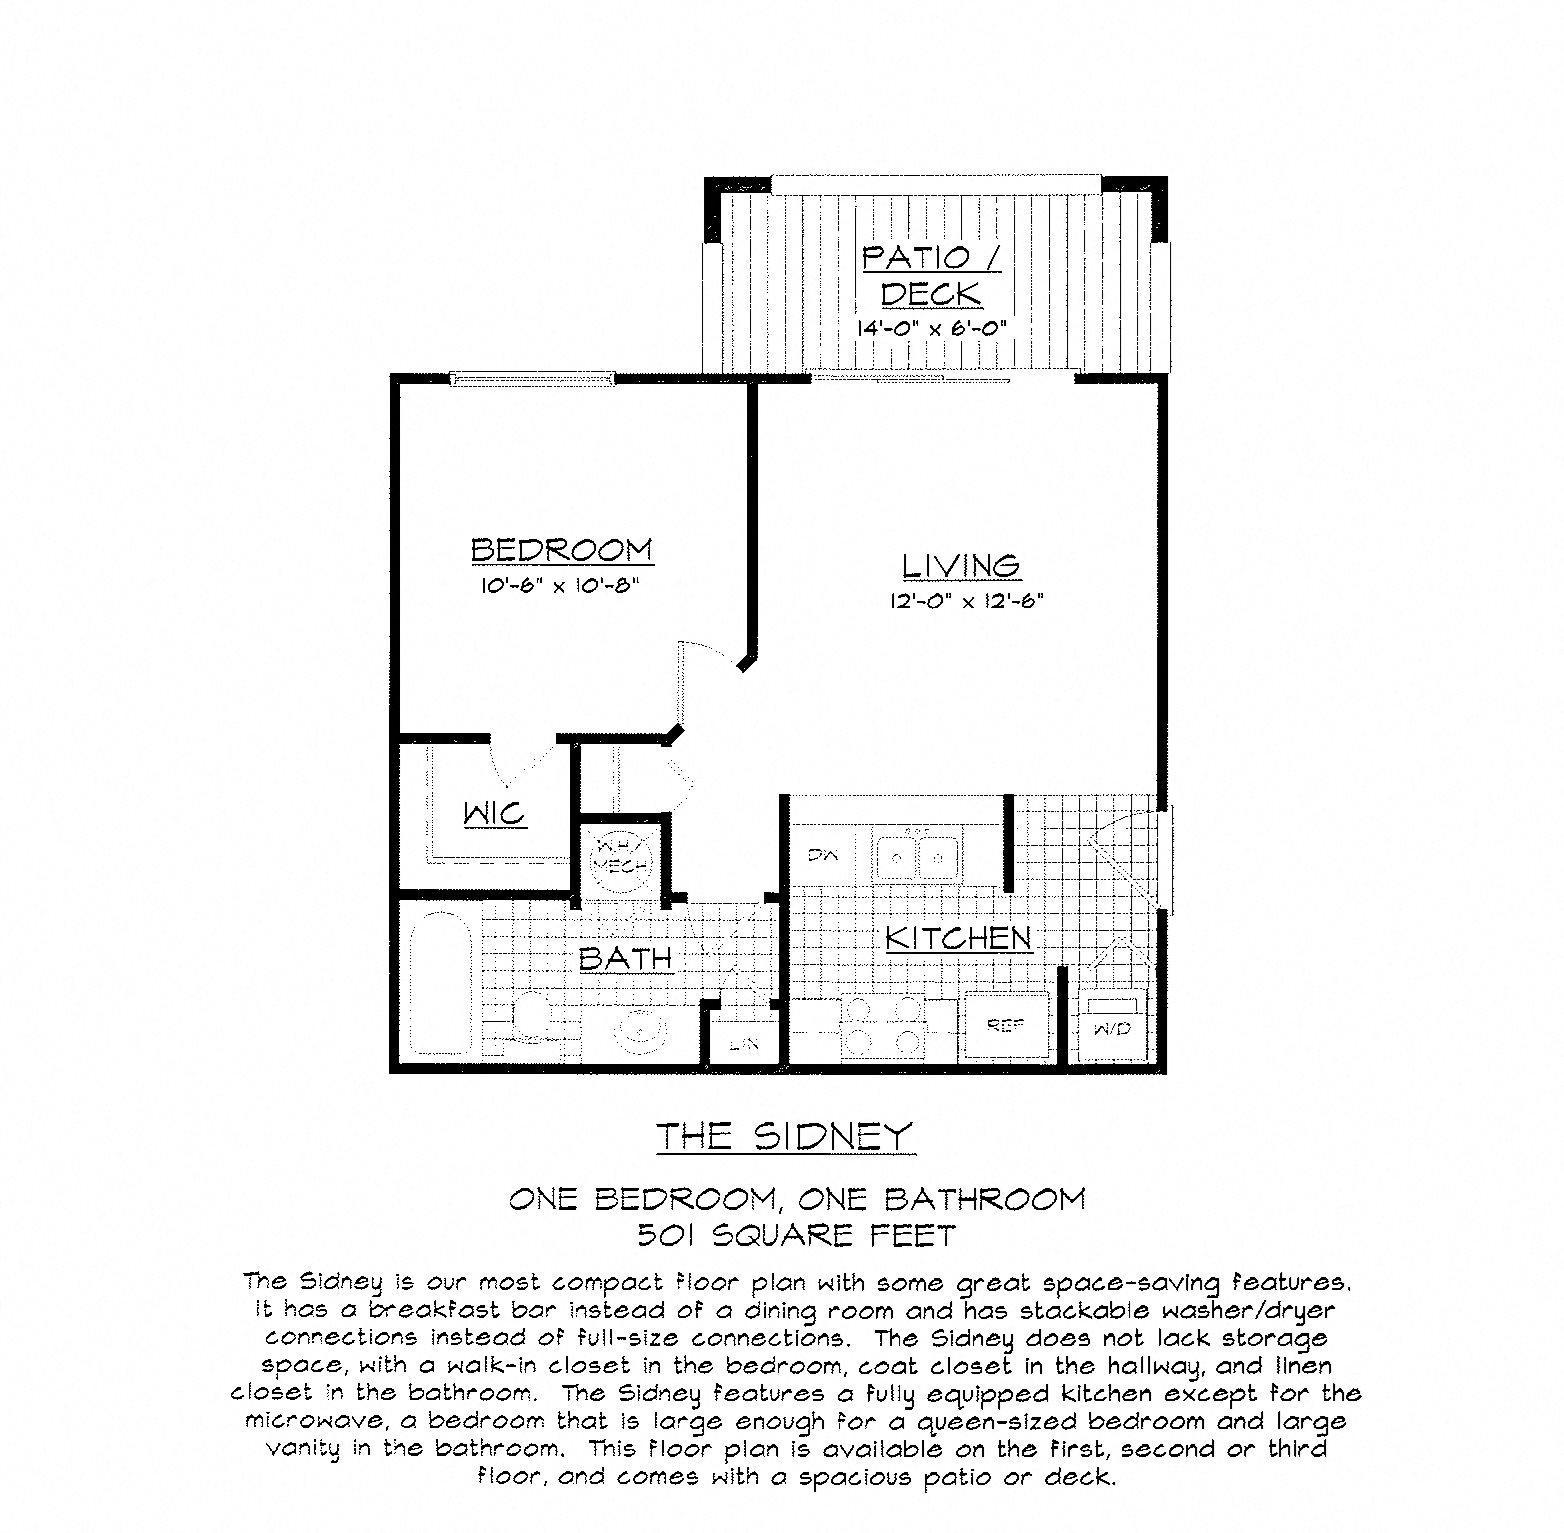 The Sidney Floor Plan 1